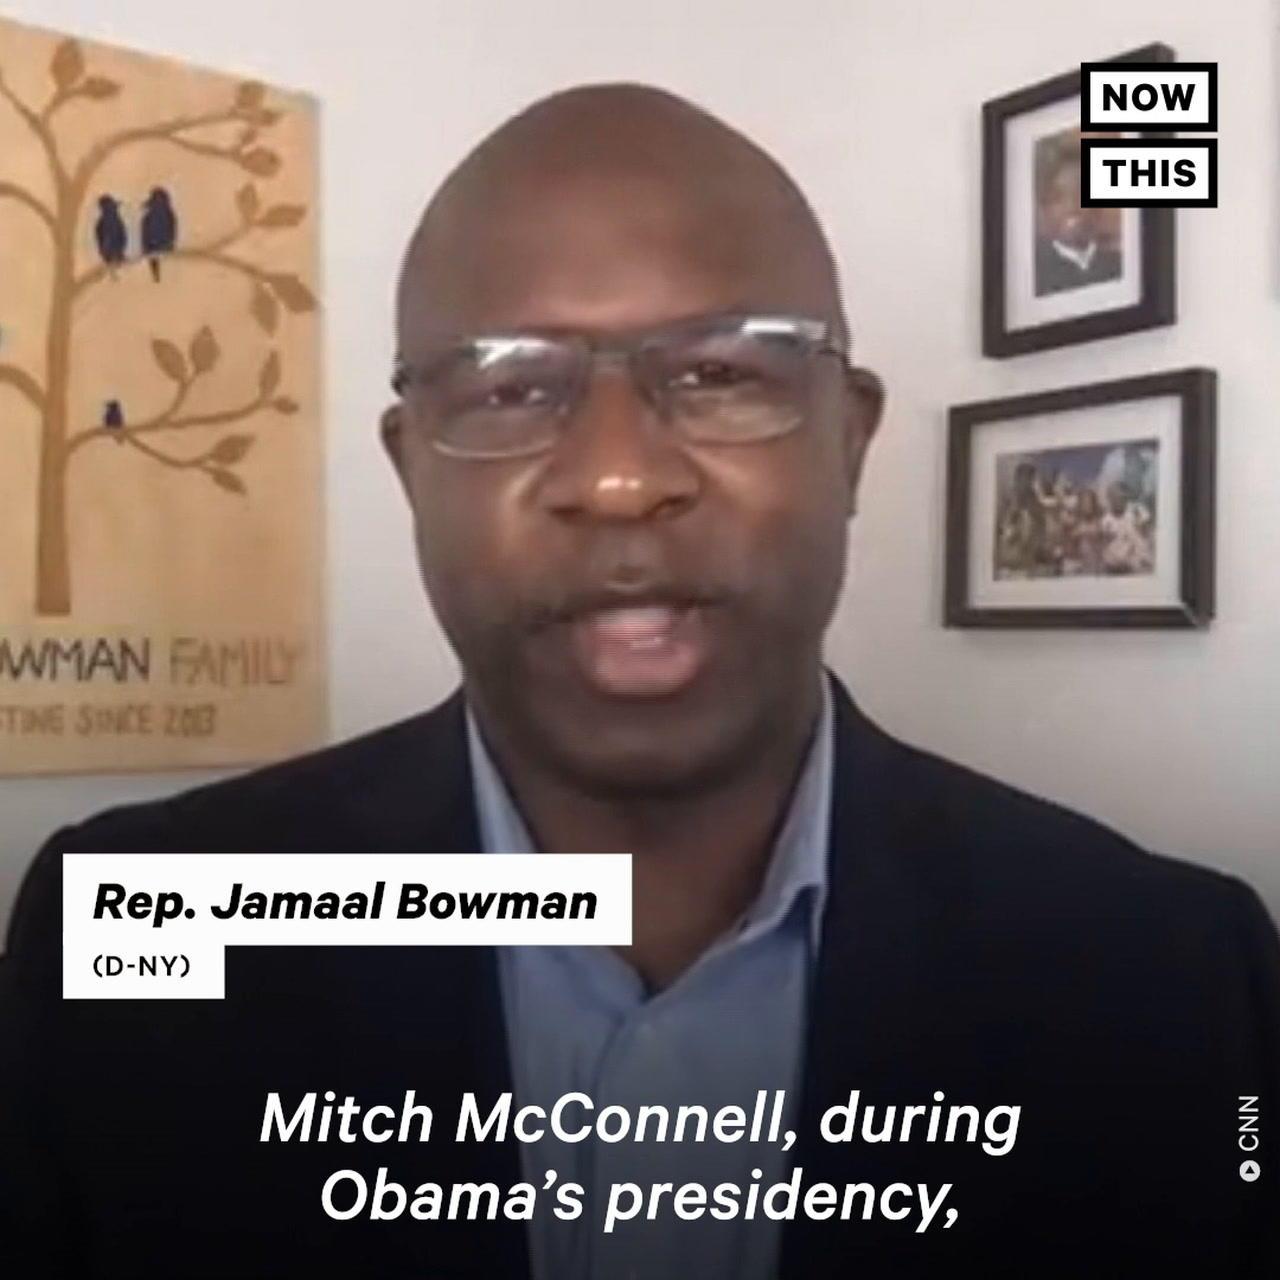 Rep. Bowman Calls Sen. Manchin 'The New Mitch McConnell'